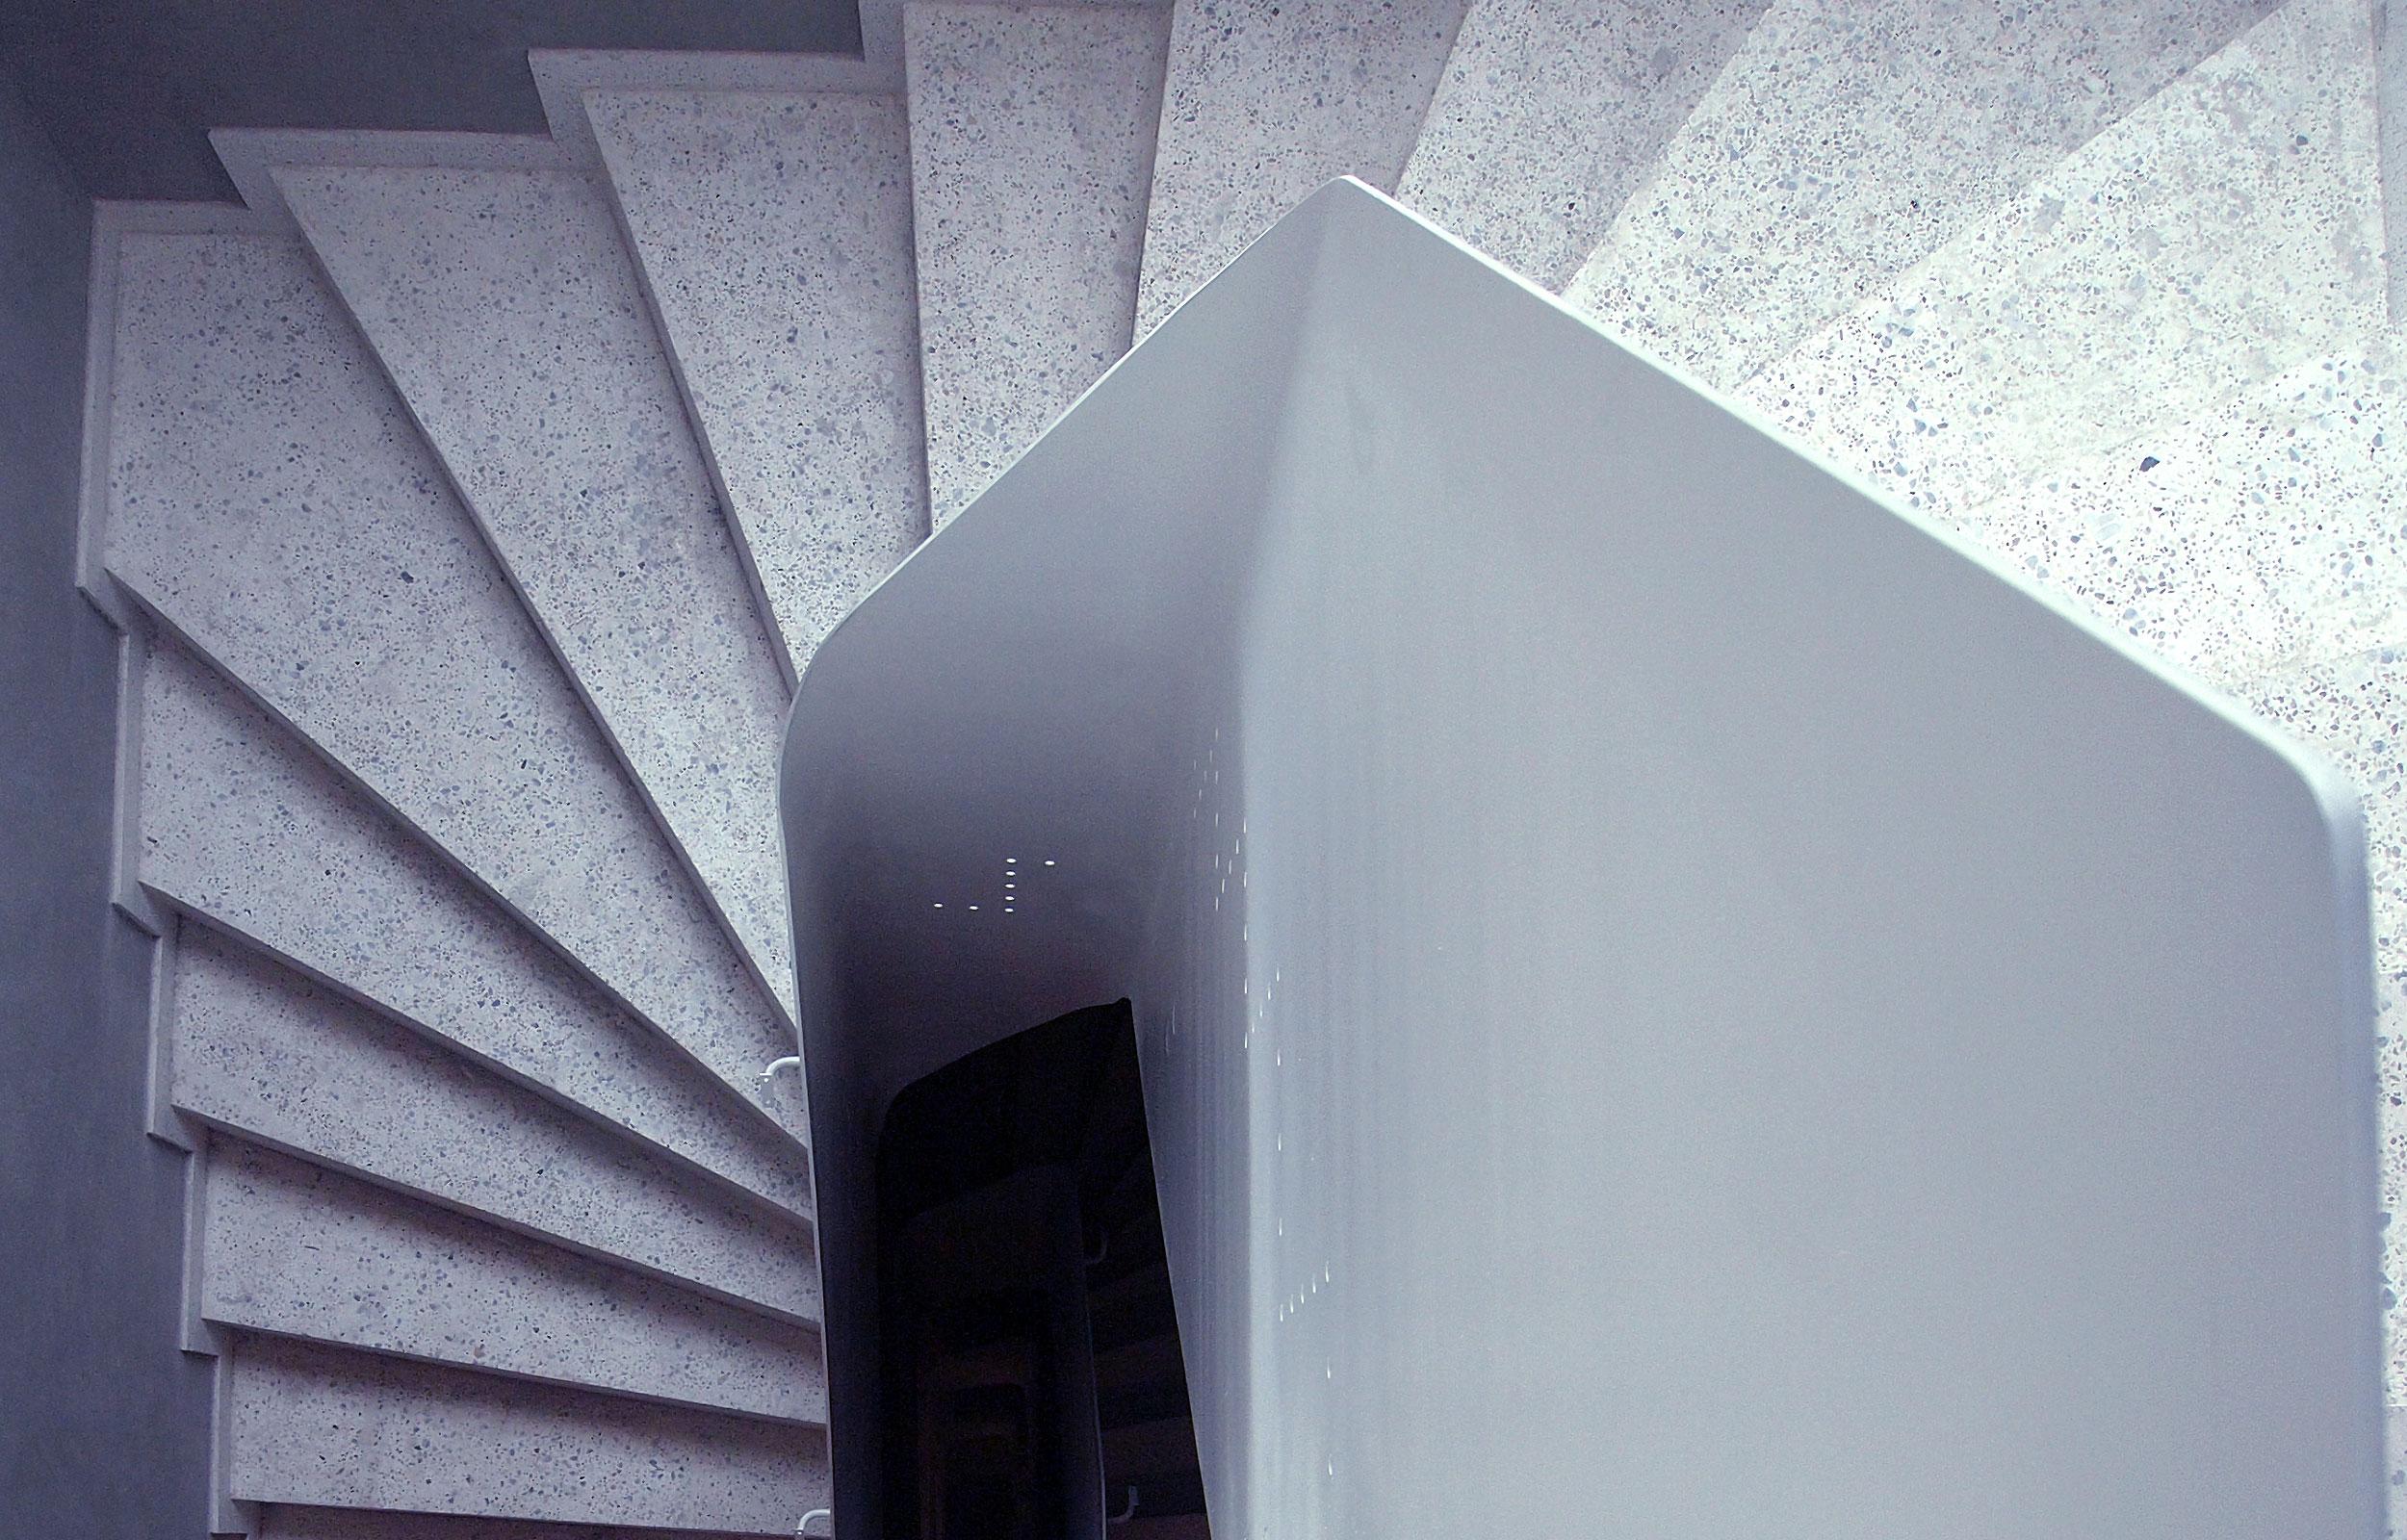 Scara metal balustrada flat haute couture